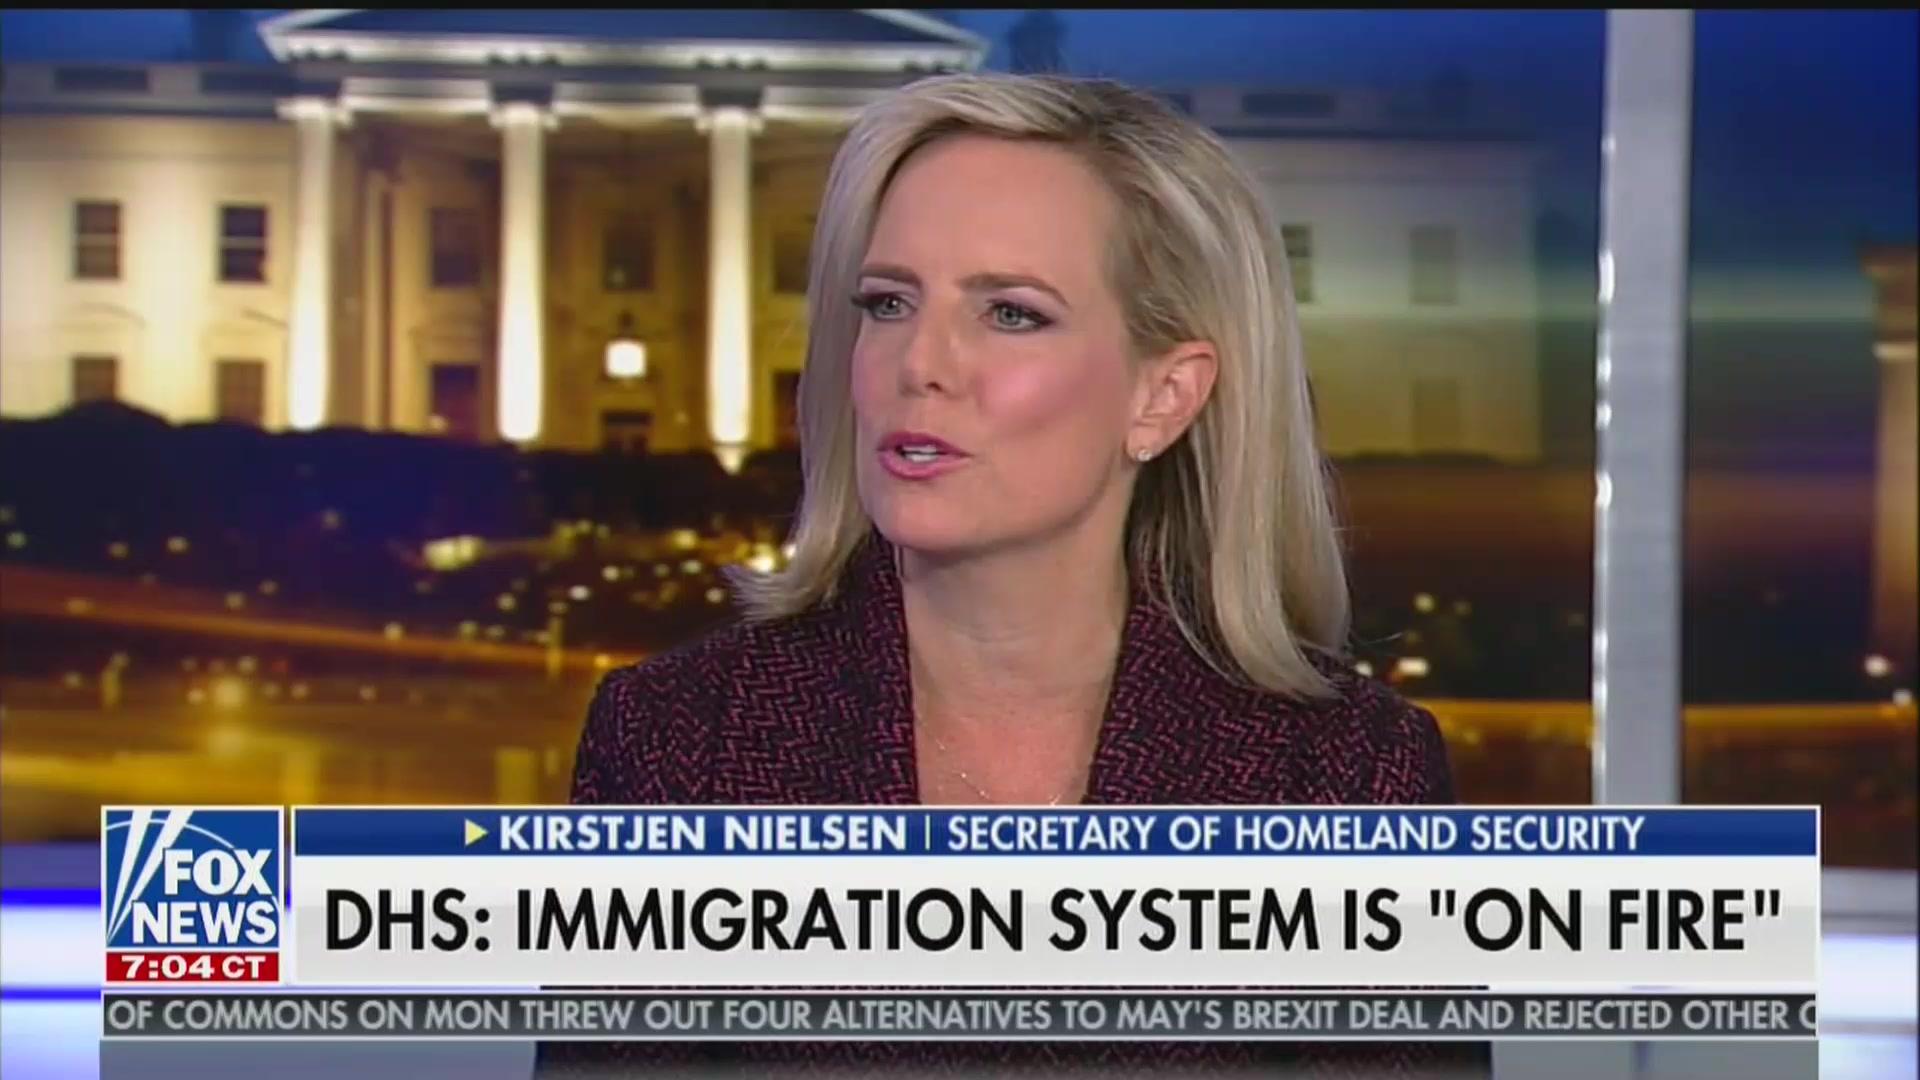 Kirstjen Nielsen Tells Tucker Carlson That Eliminating Birthright Citizenship Is 'On the Table'